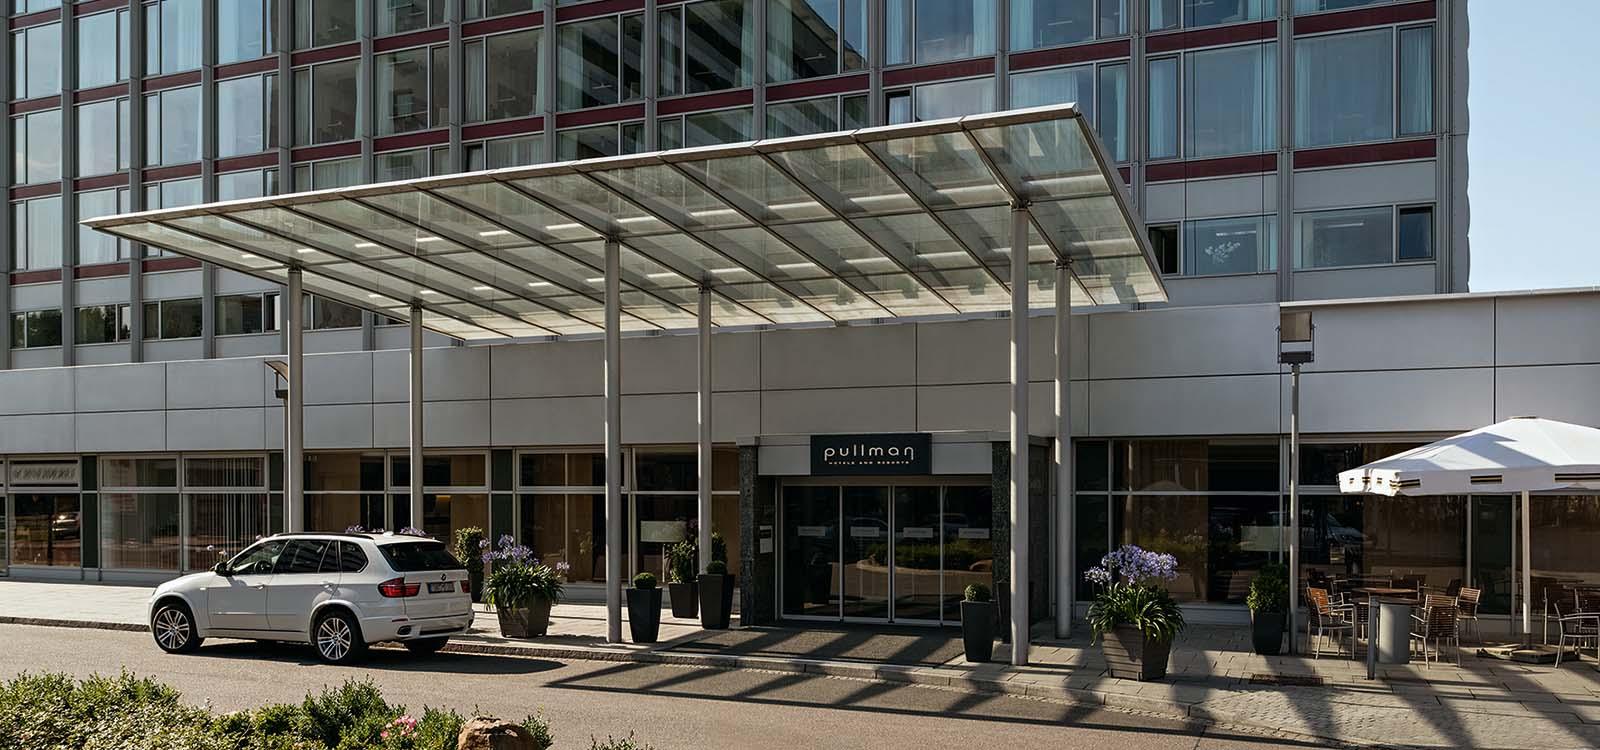 pullman dresden event hotels intl markenhotellerie in deutschland europa. Black Bedroom Furniture Sets. Home Design Ideas